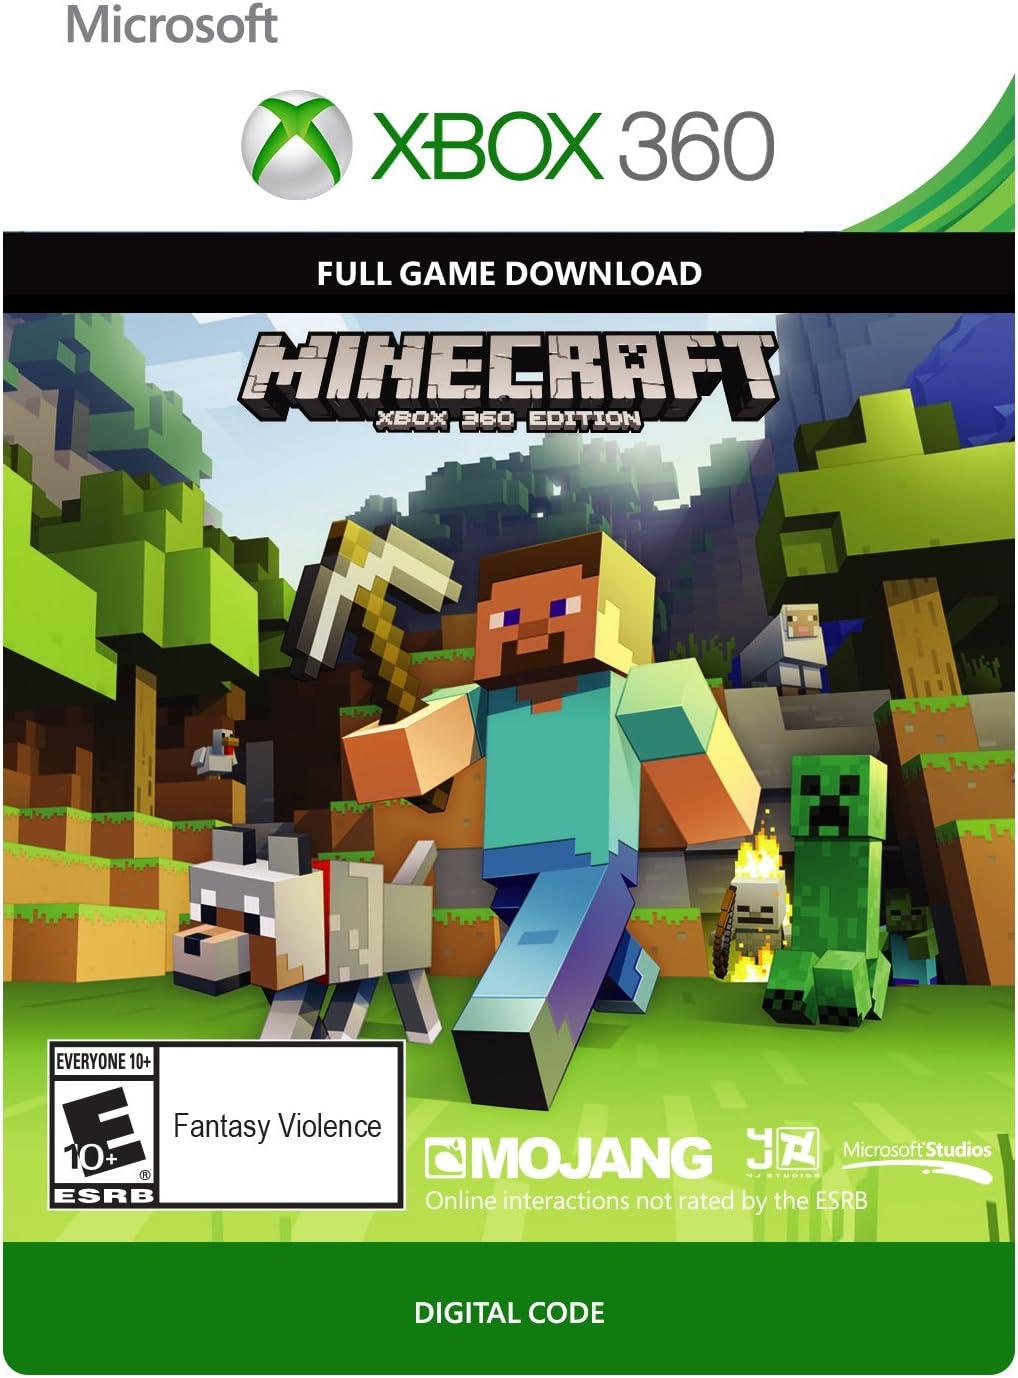 Amazoncom Minecraft Xbox Digital Code Video Games - Skins gratis minecraft xbox 360